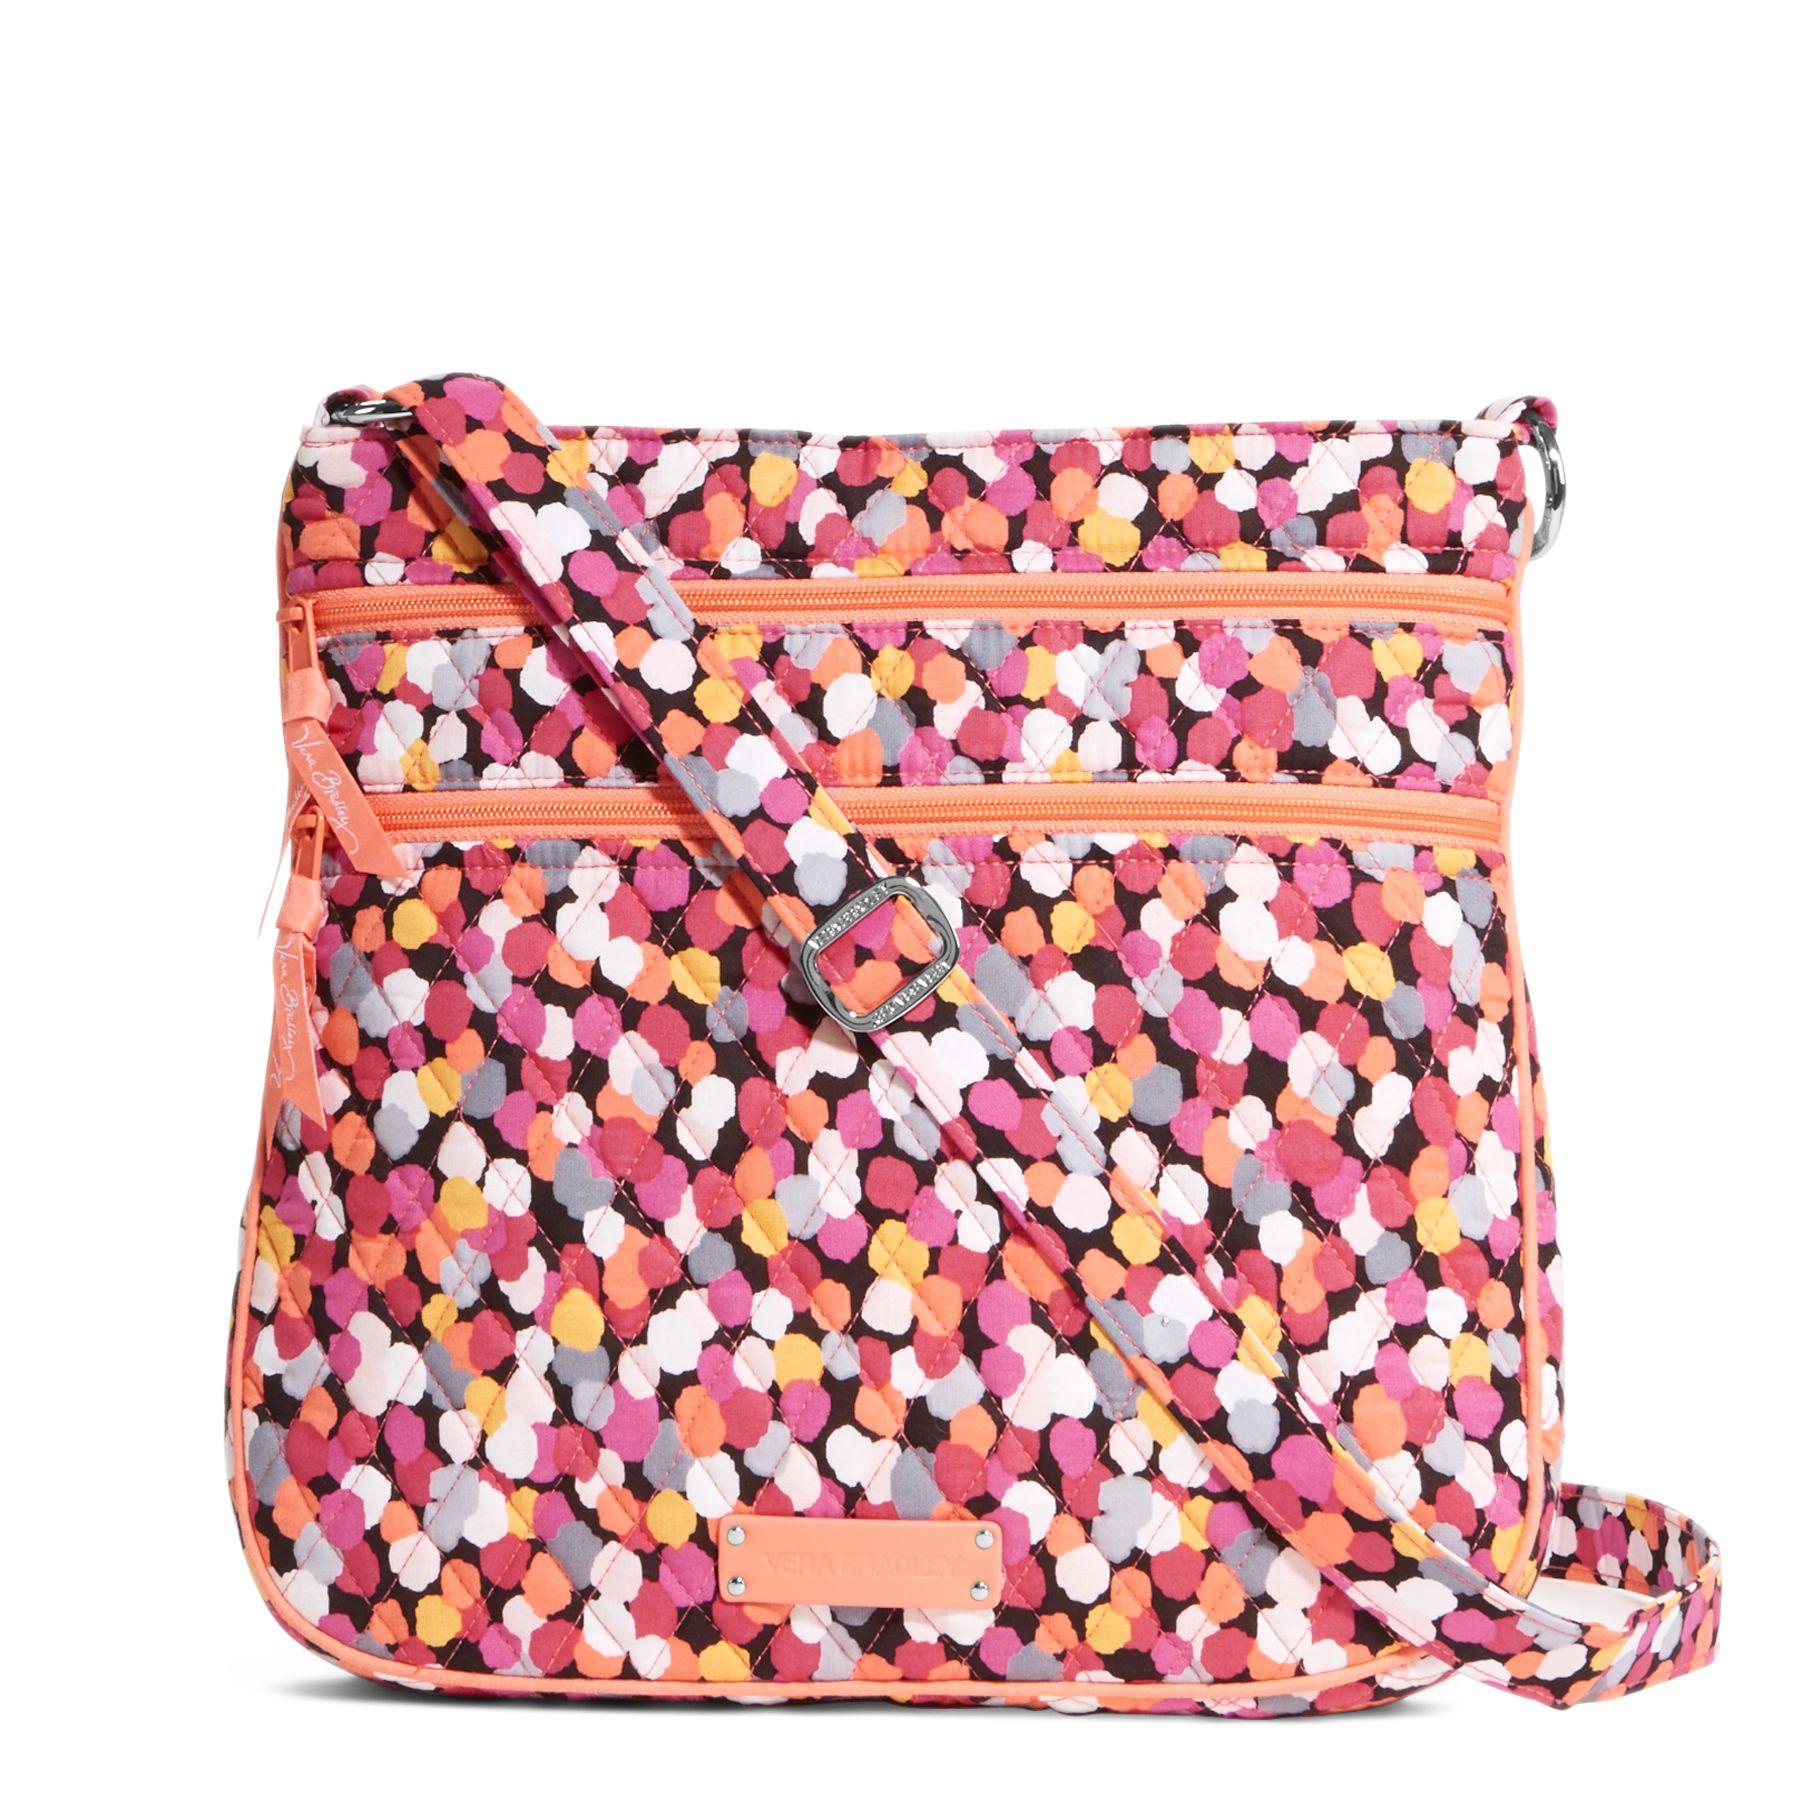 Vera Bradley Triple Zip Hipster Crossbody Bag $19.99